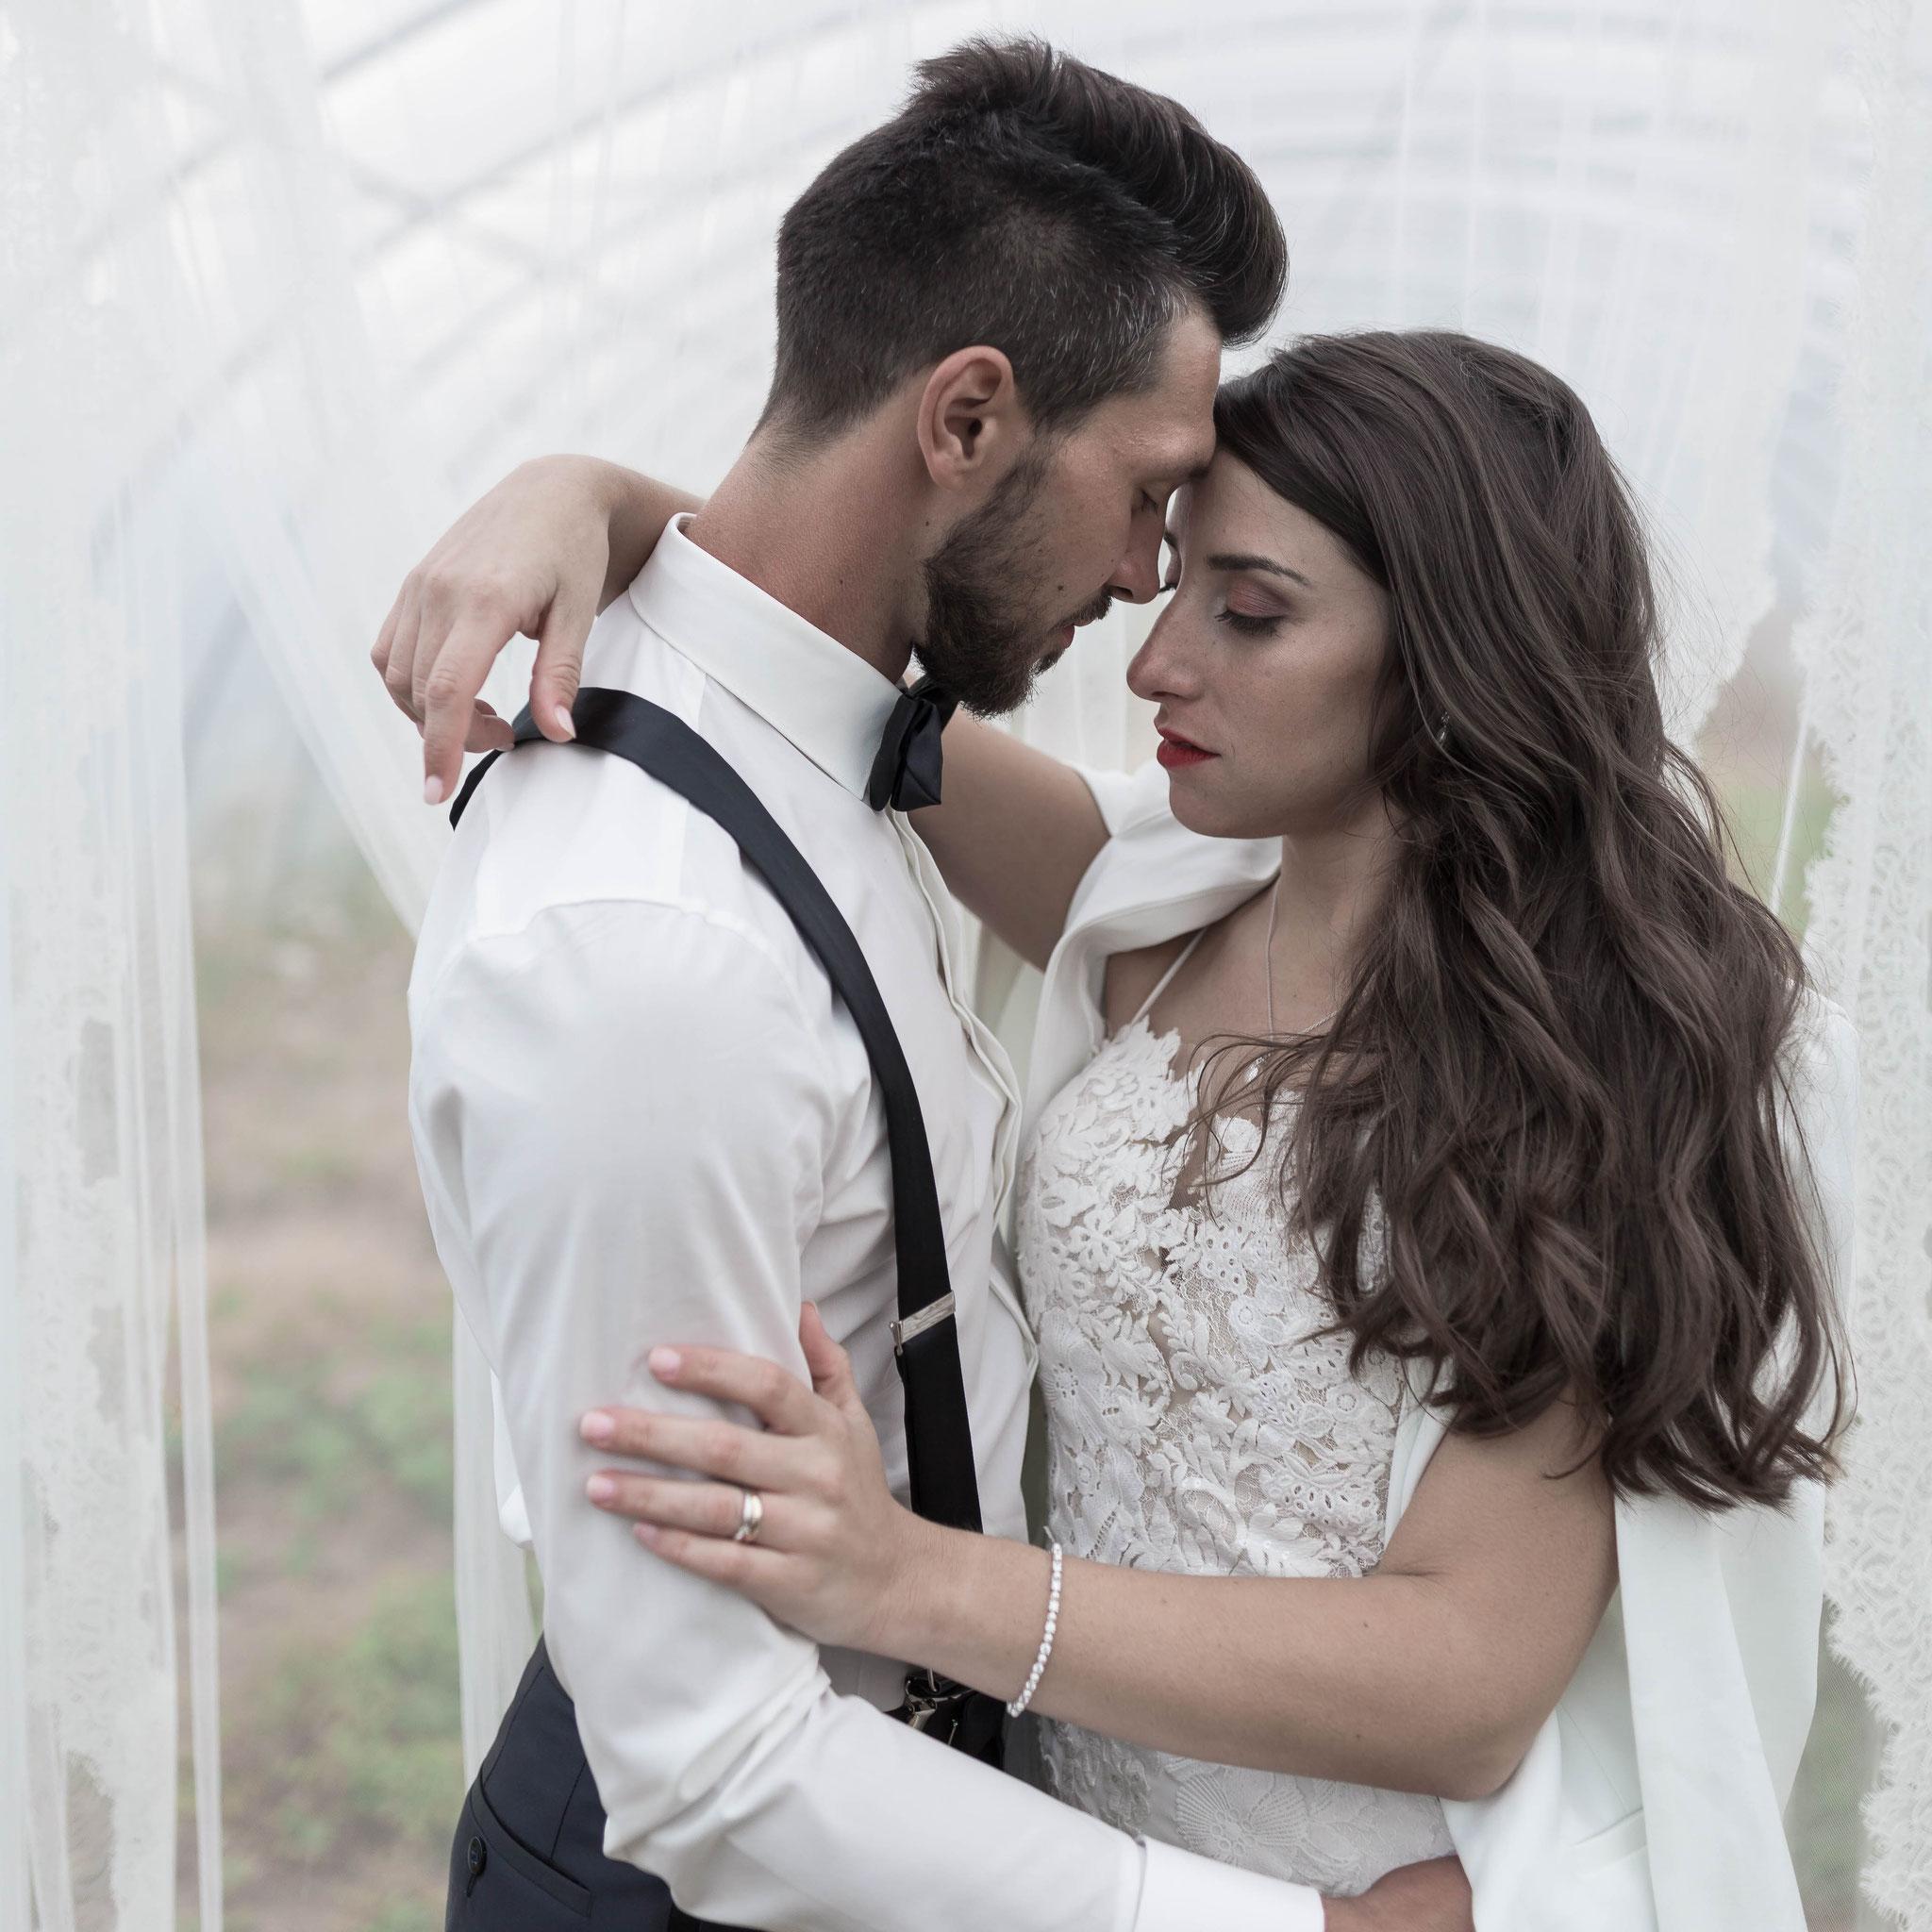 Mein Hochzeitsfotograf in Nidda und Umgebung